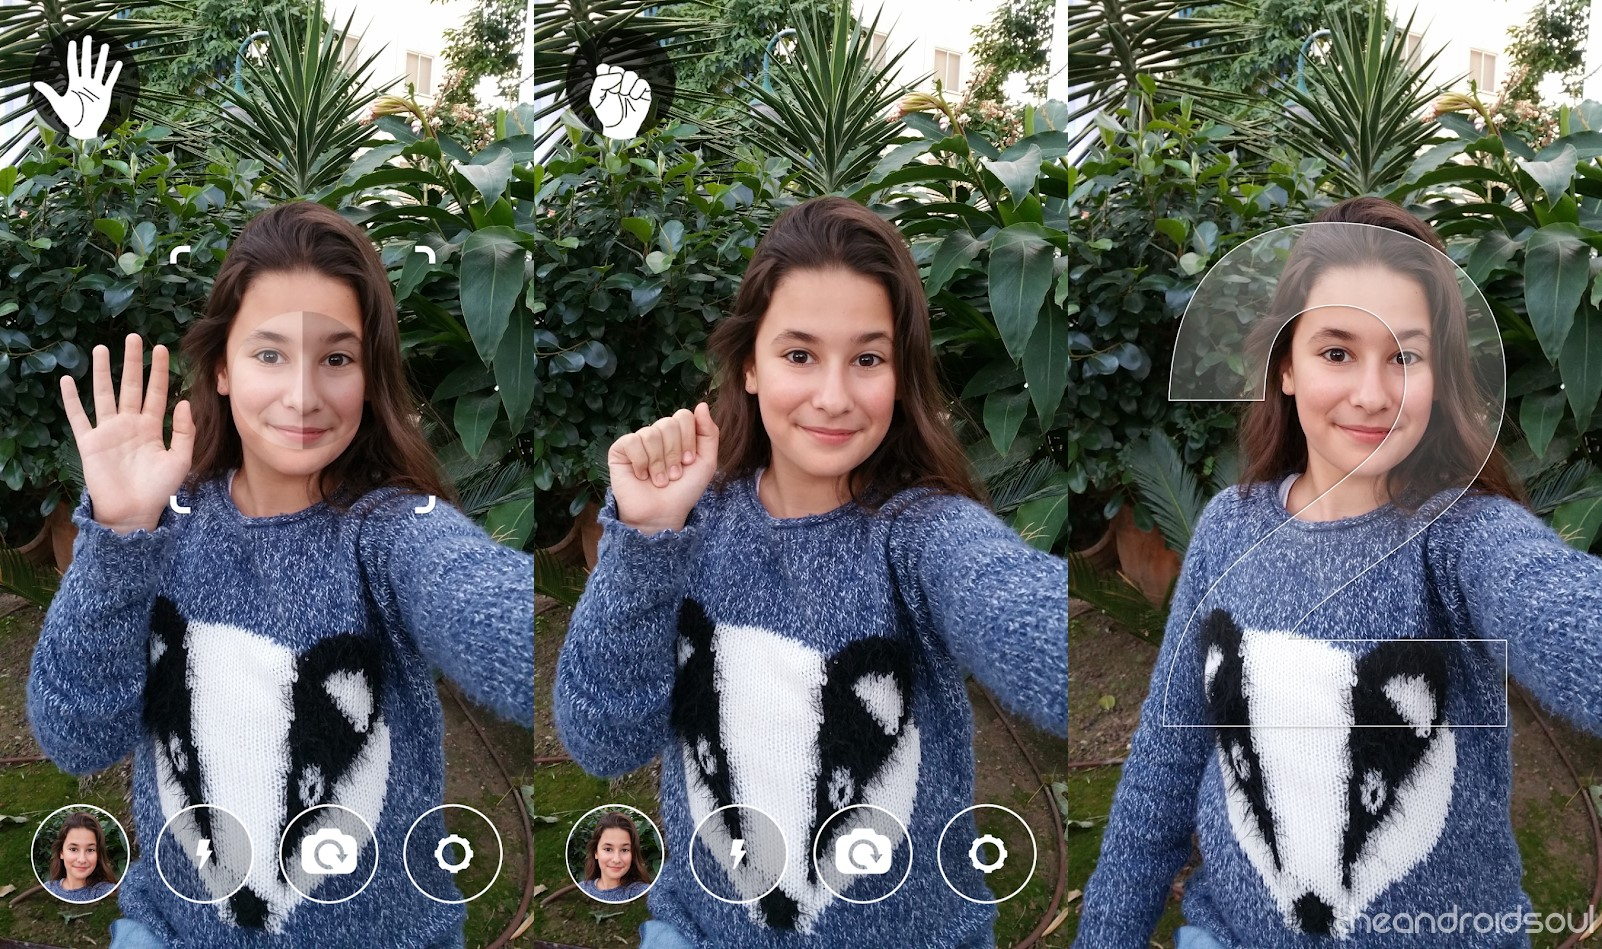 snapi gesture selfie